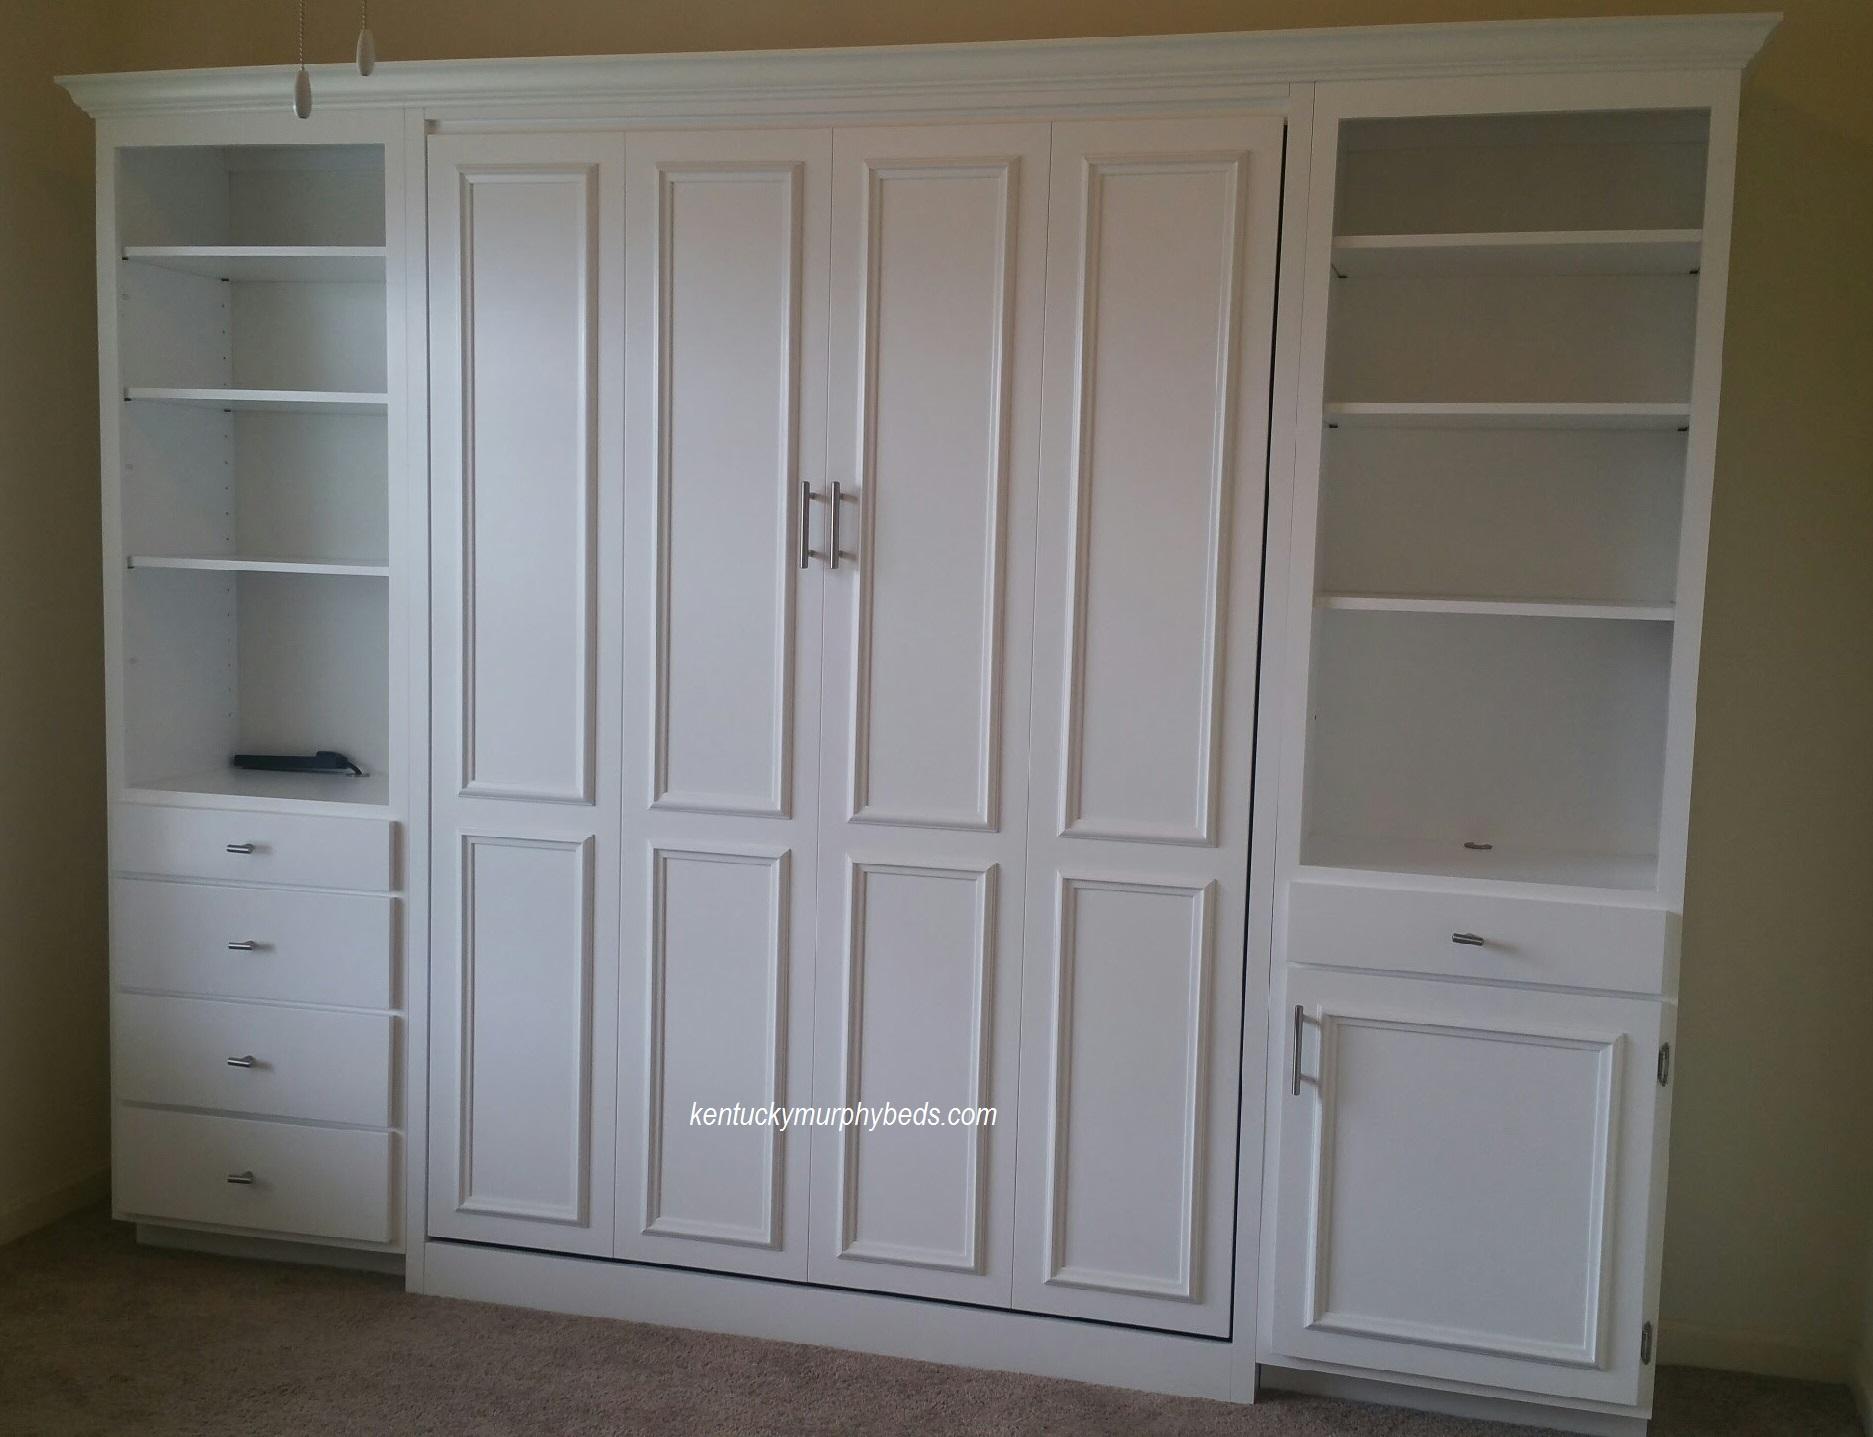 queen murphy bed with surface trim on panel and cupboard door